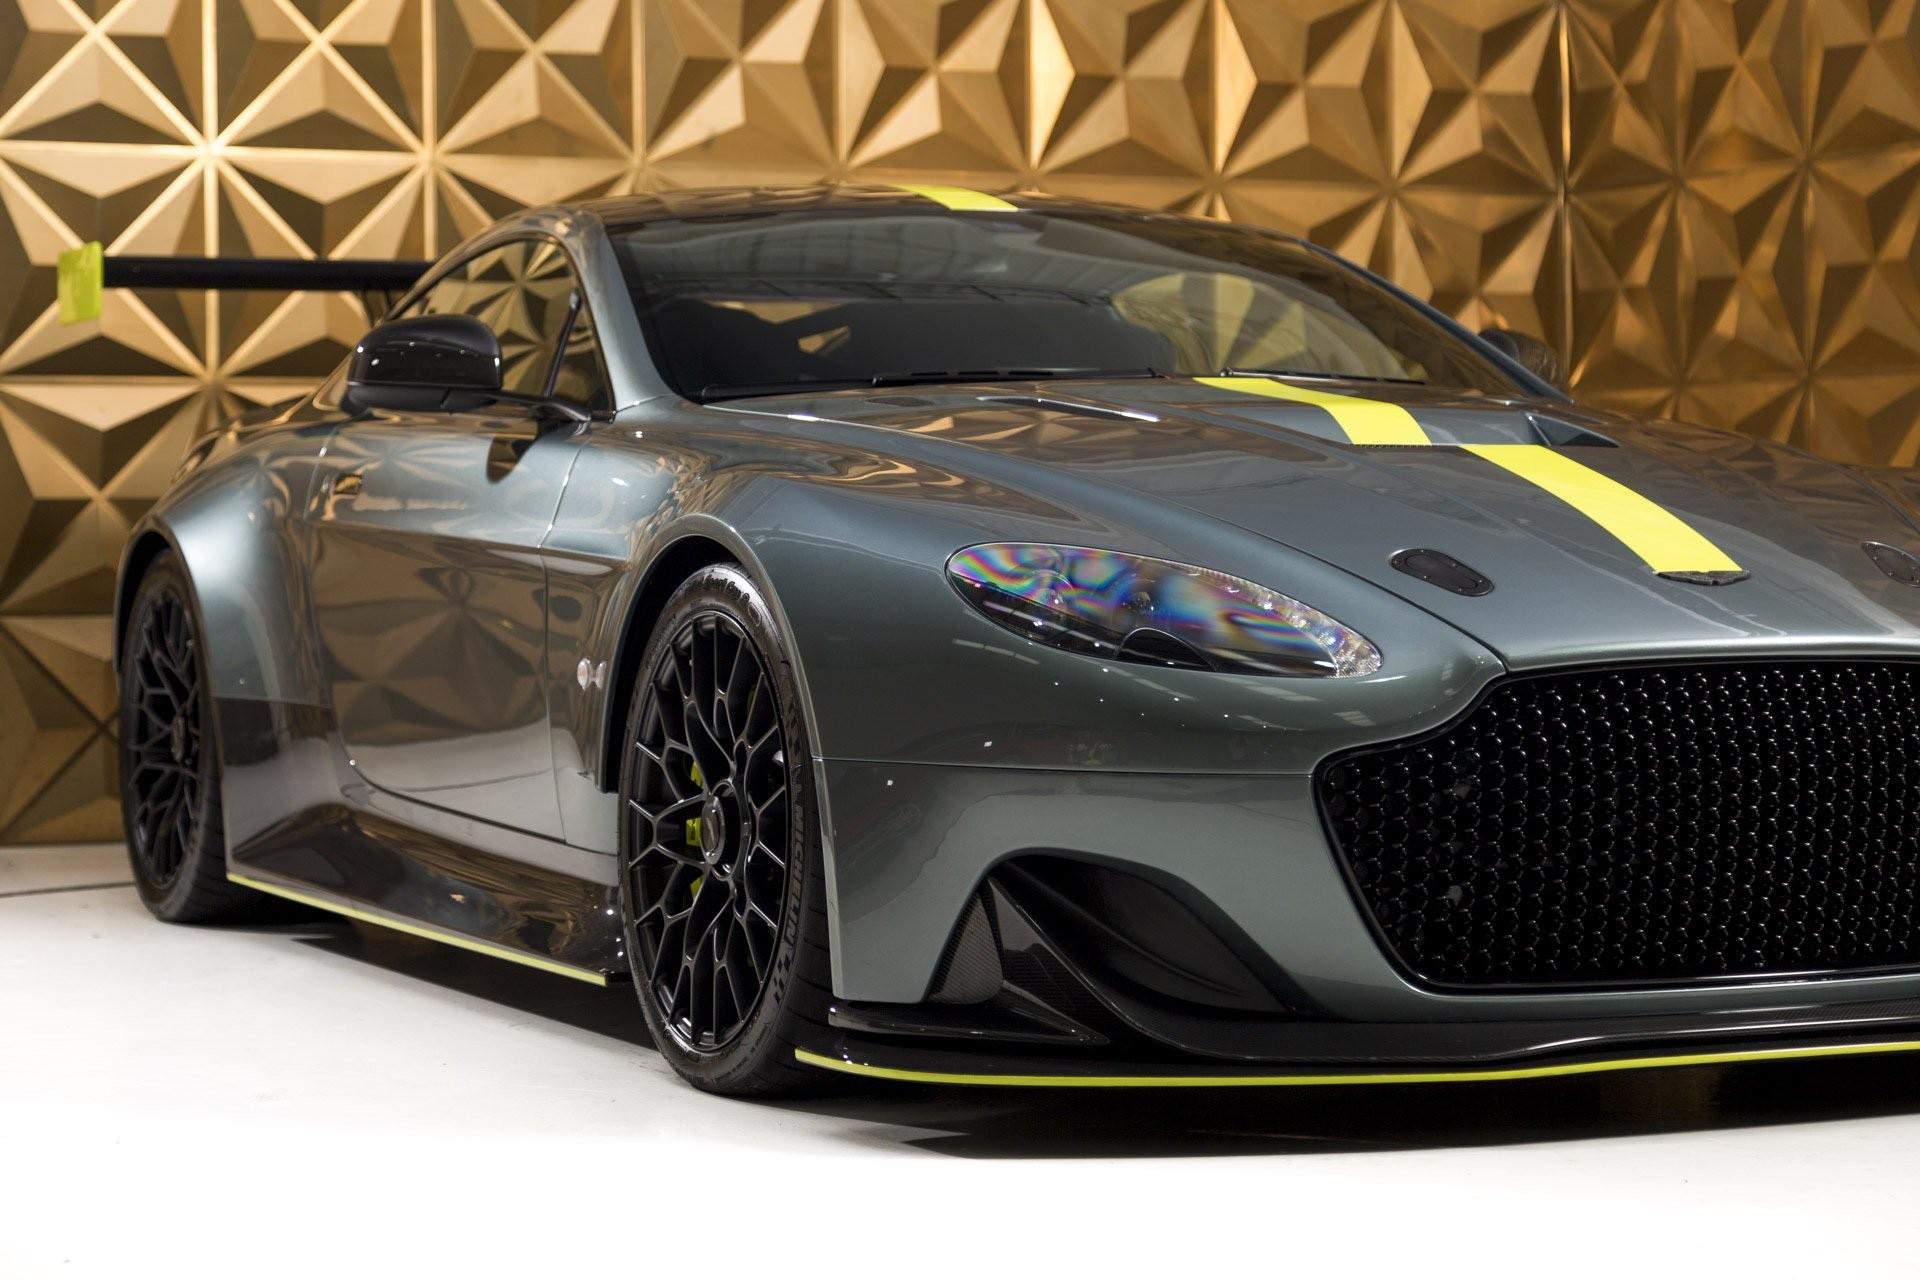 Aston_Martin_Vantage_AMR_Pro_sale-0002